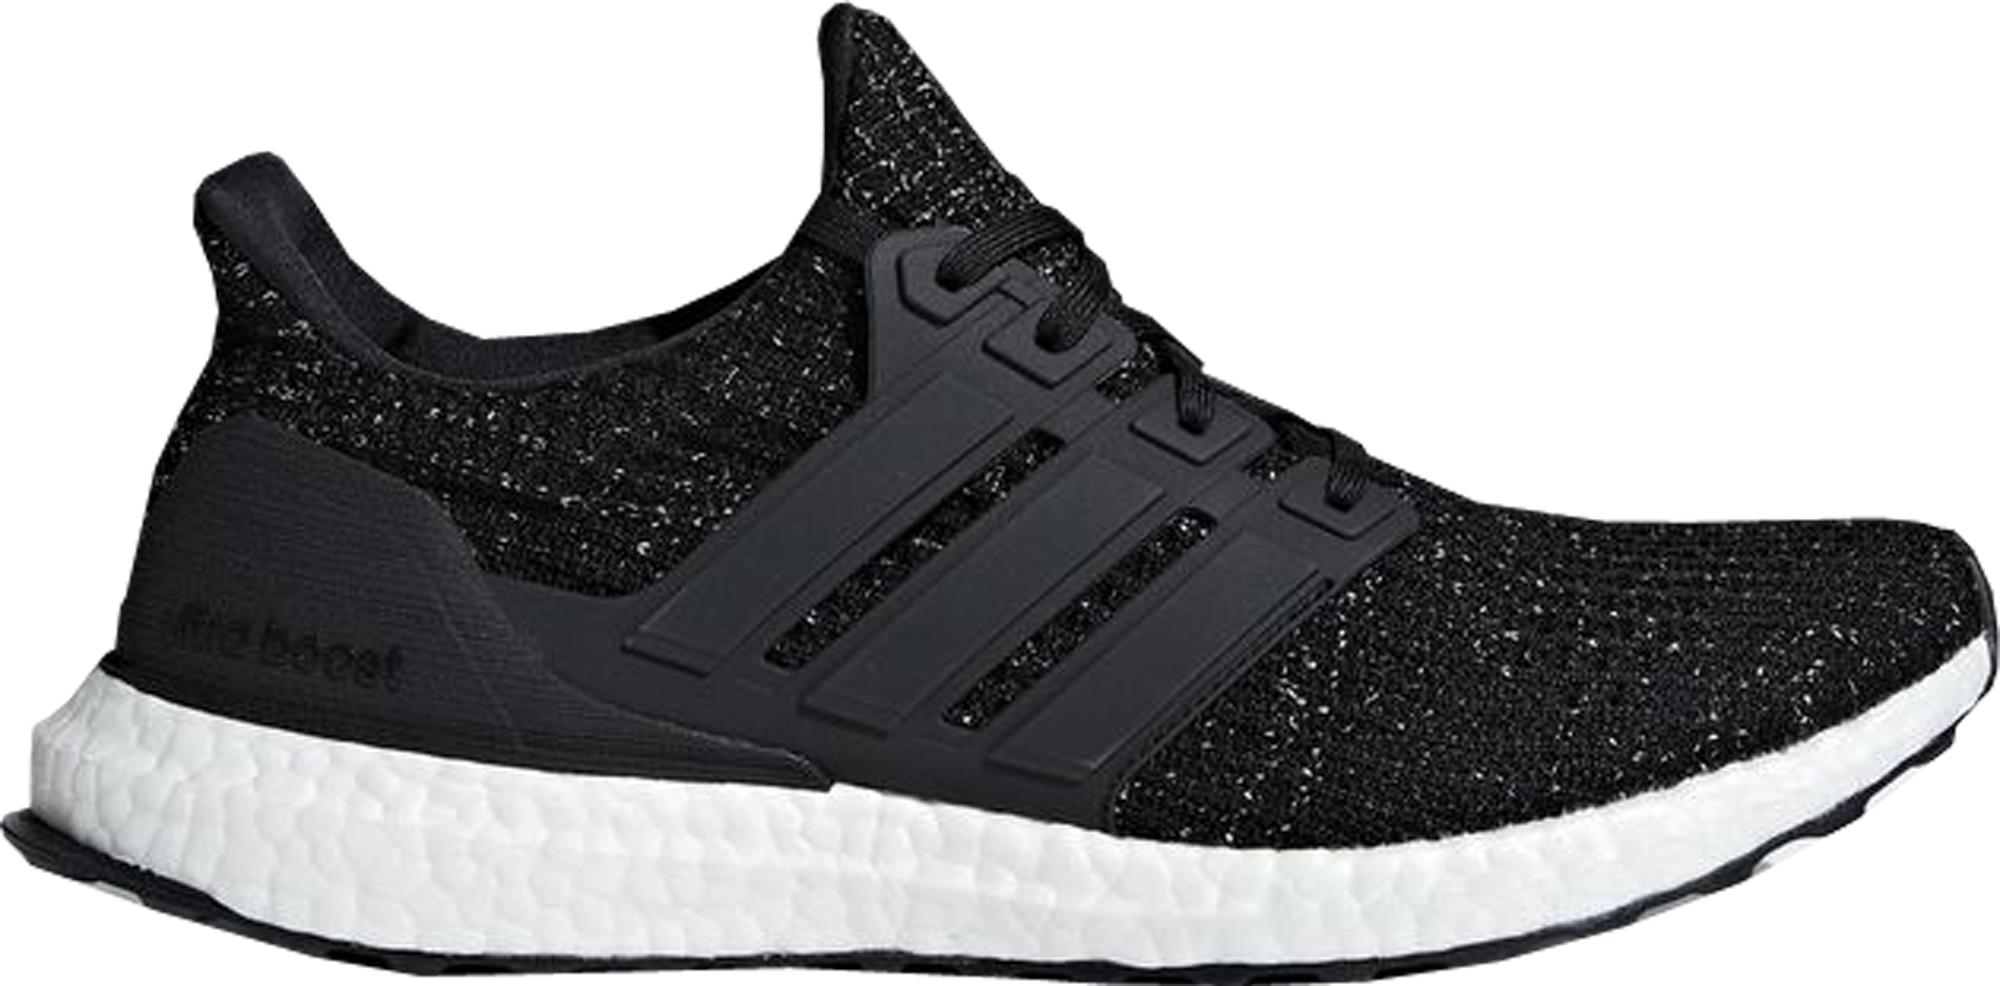 ultra boost 4.0 black white speckle